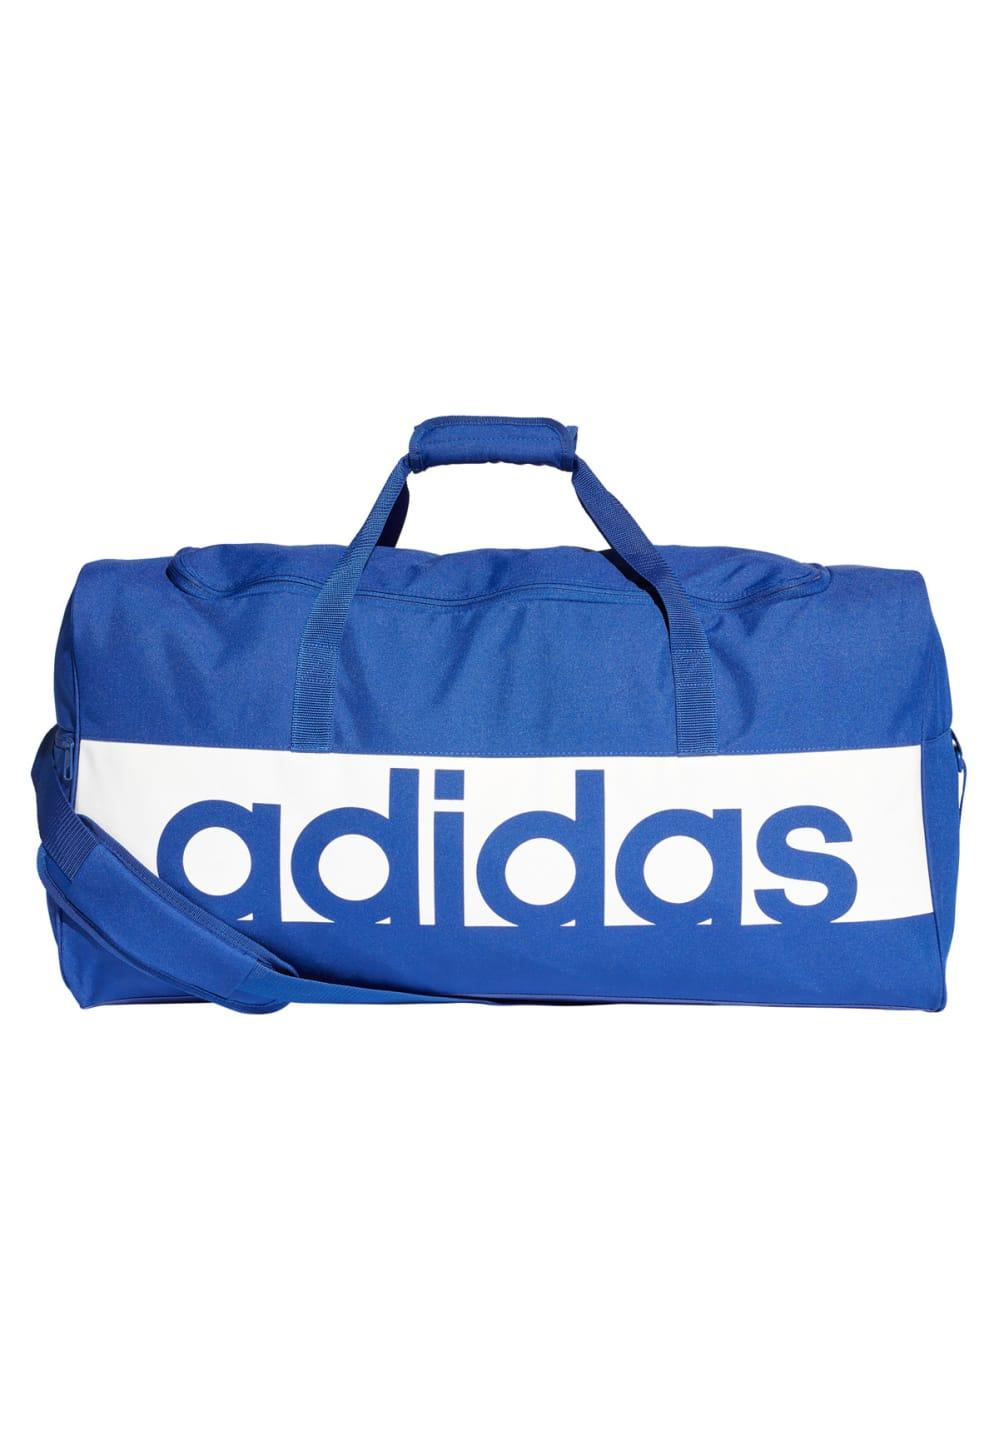 1cb78bd2e216 adidas Linear Performance Duffel Bag Large - Sports bags - Blue